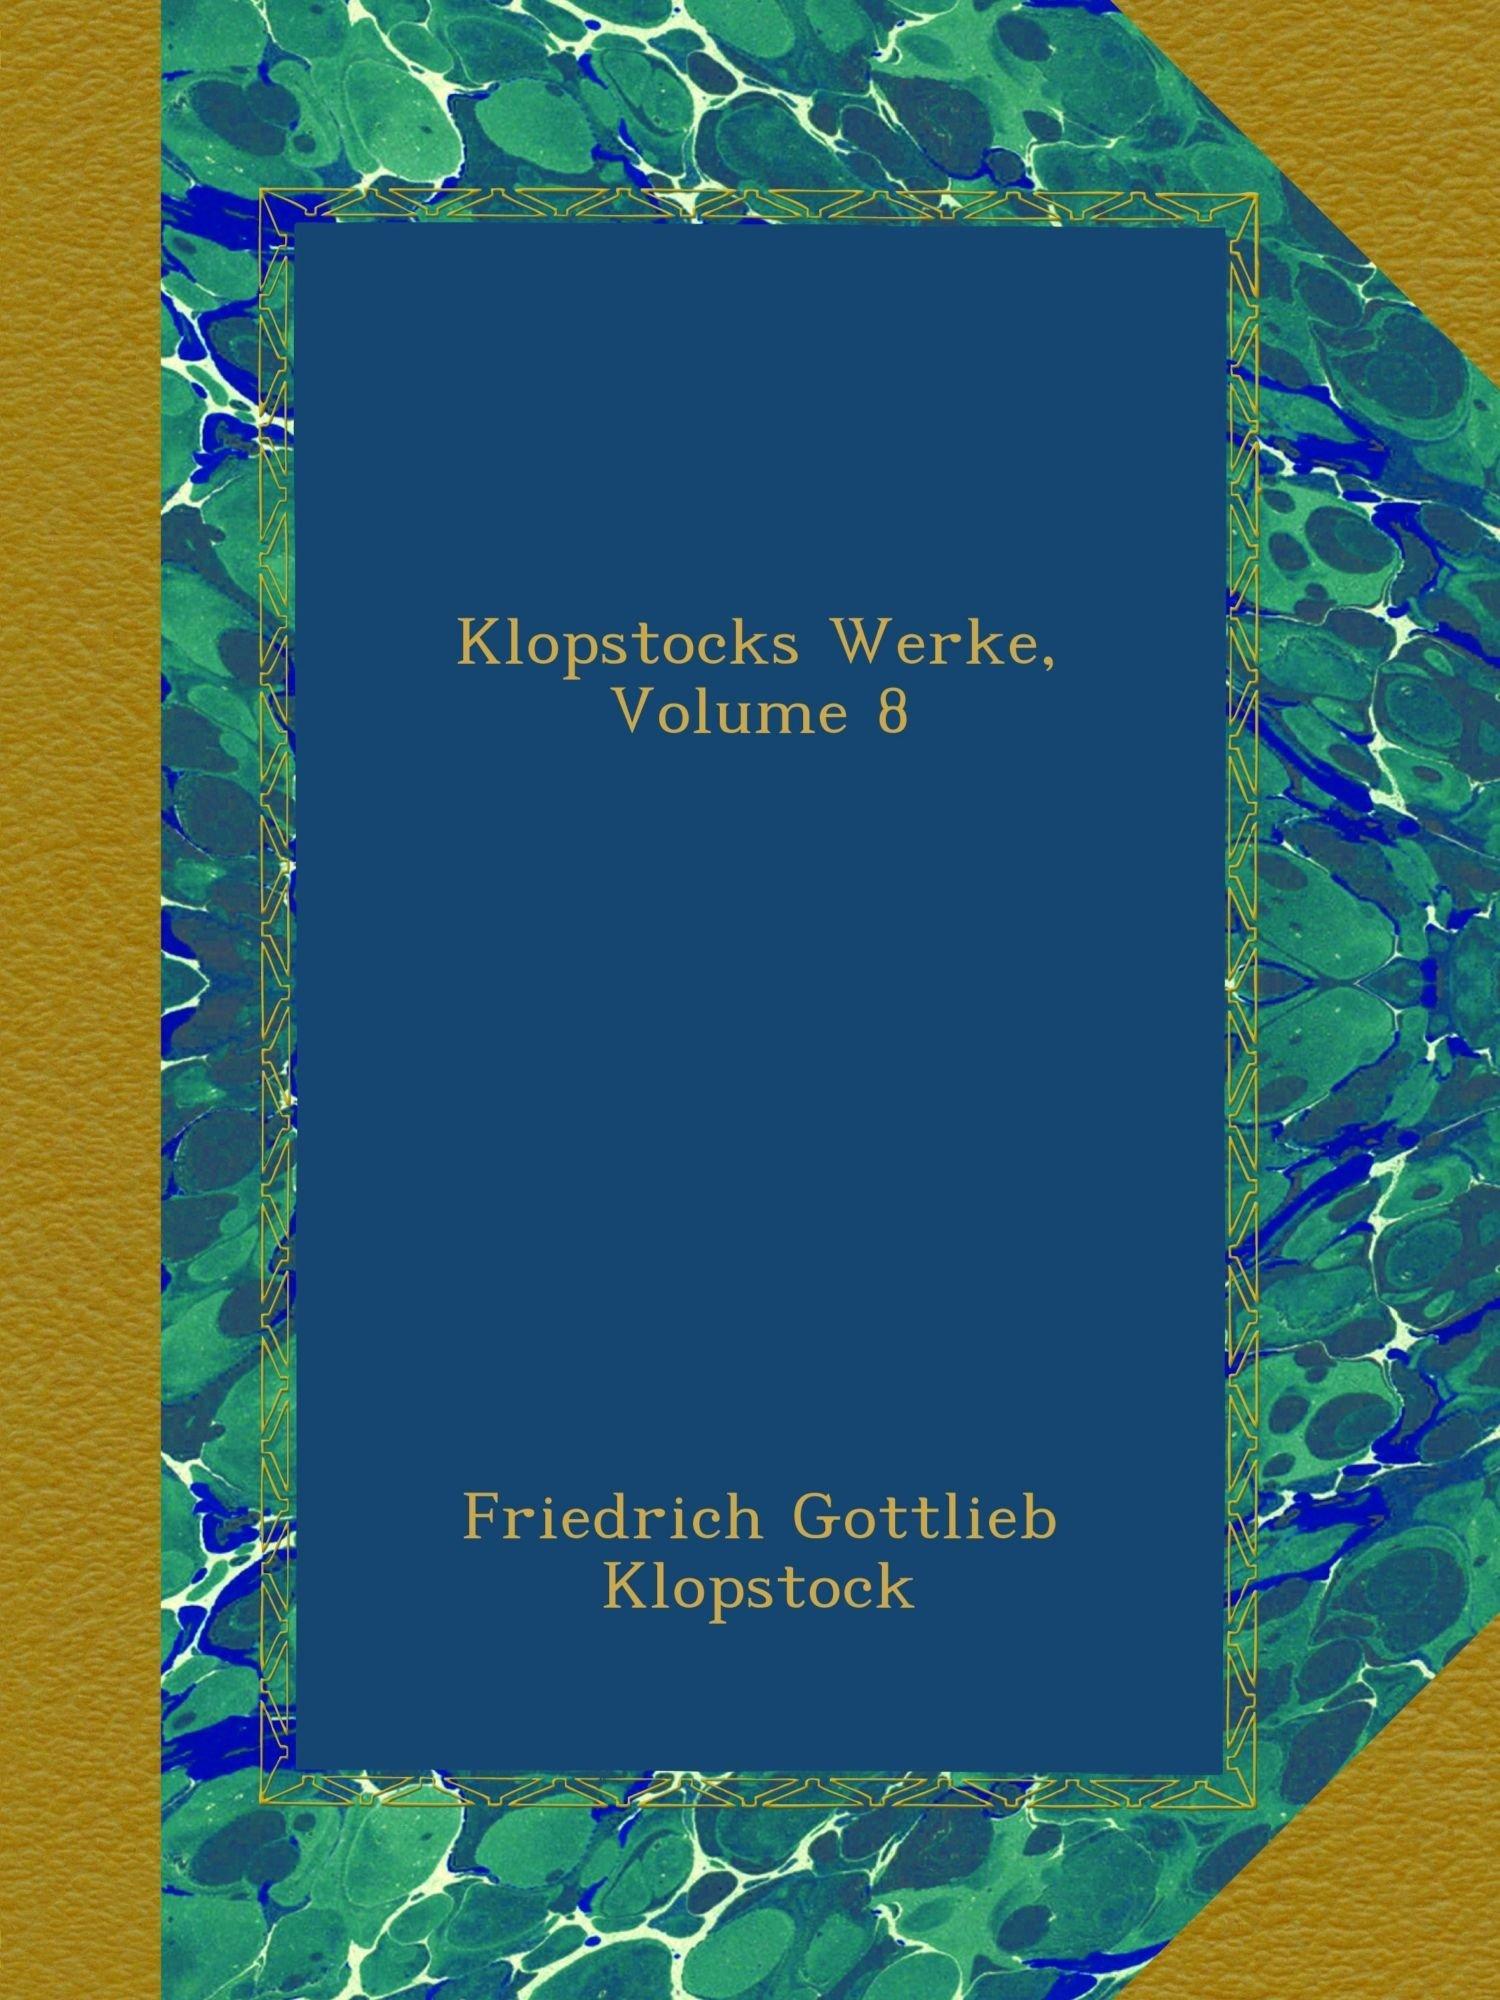 Klopstocks Werke, Volume 8 (German Edition) PDF